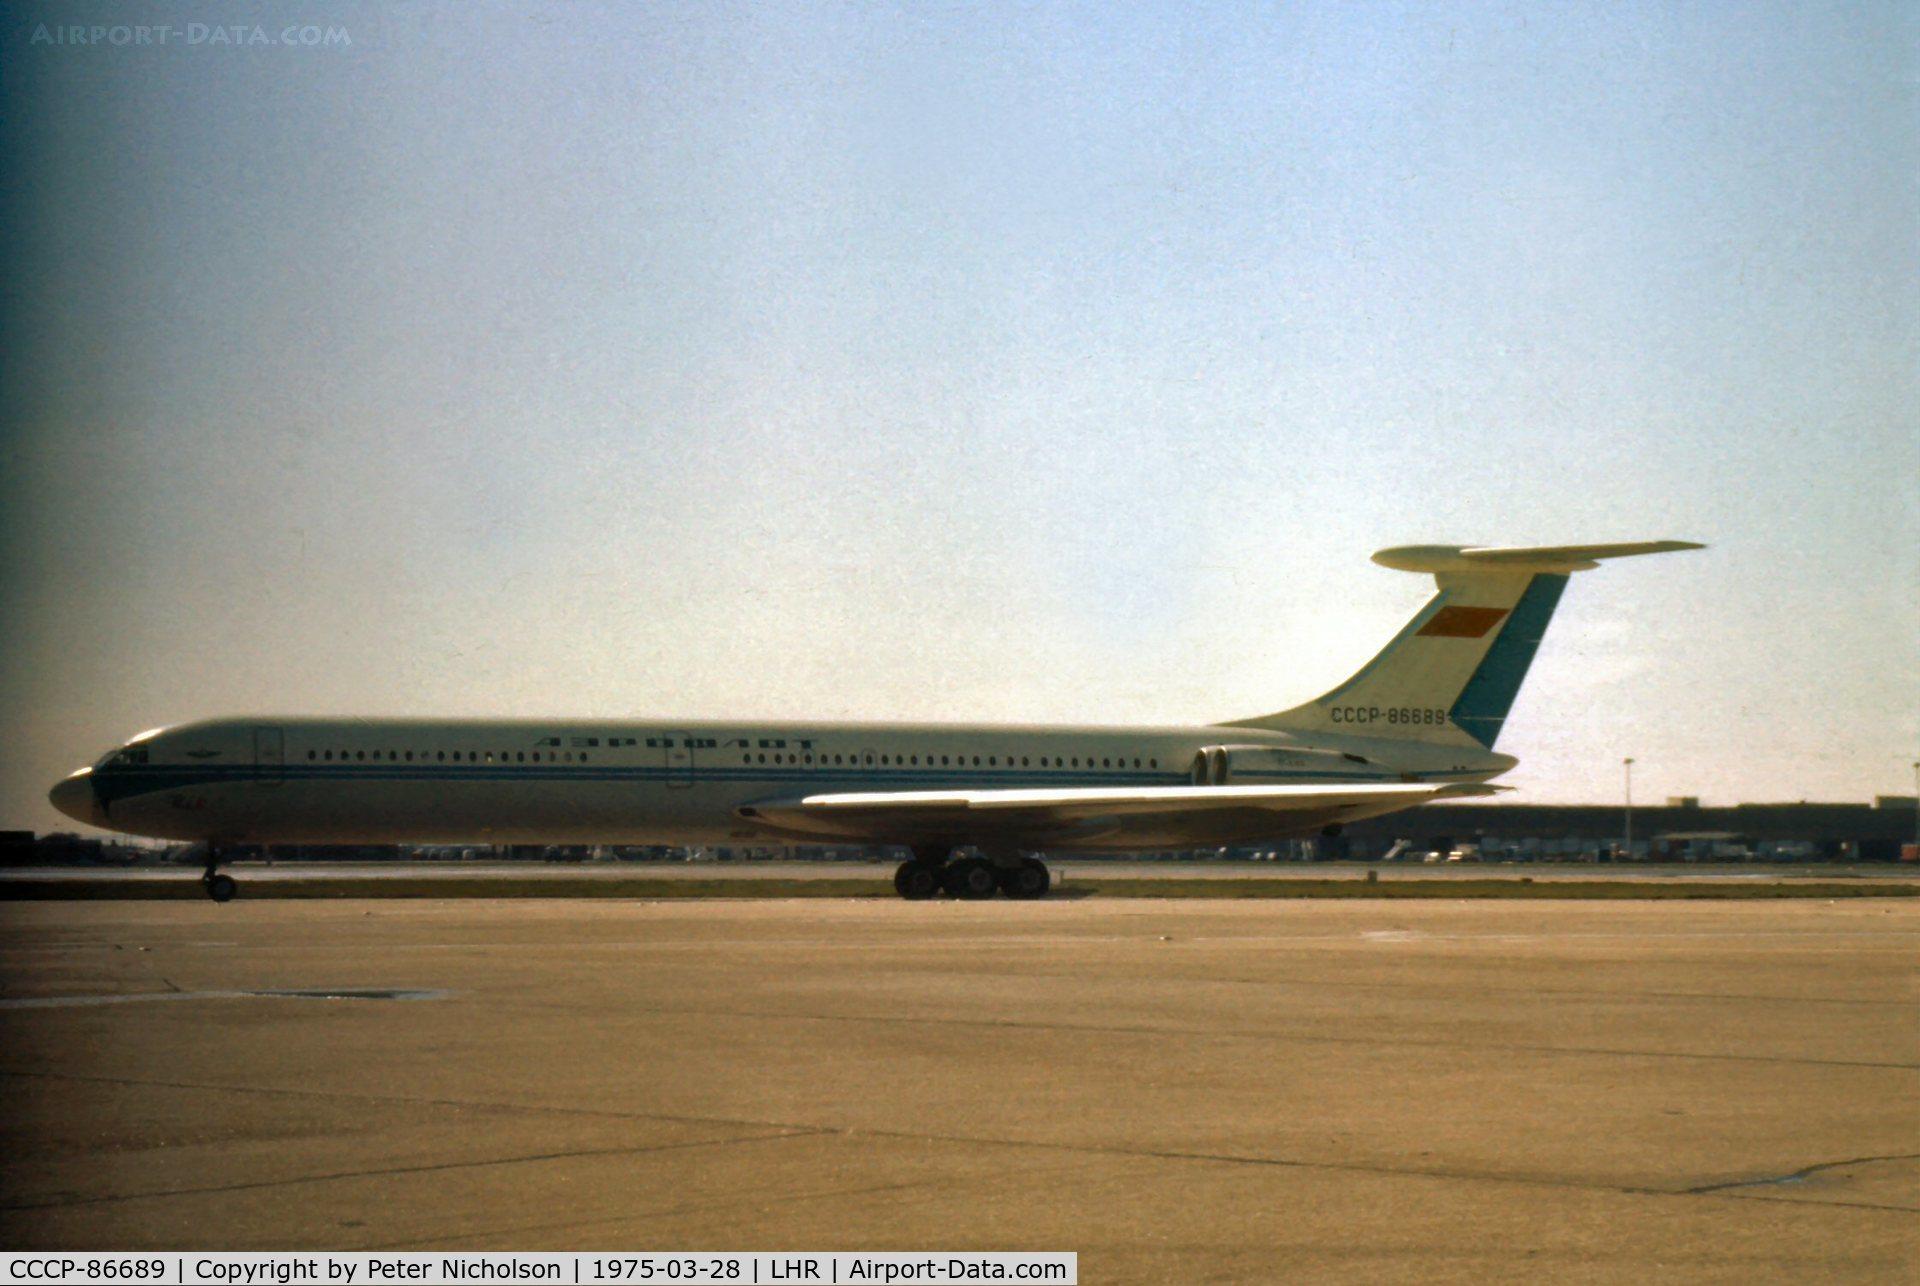 CCCP-86689, 1971 Ilyushin IL-62 C/N 11001, Ilyushin Il-62 Classic of Aeroflot at Heathrow in the Spring of 1975.